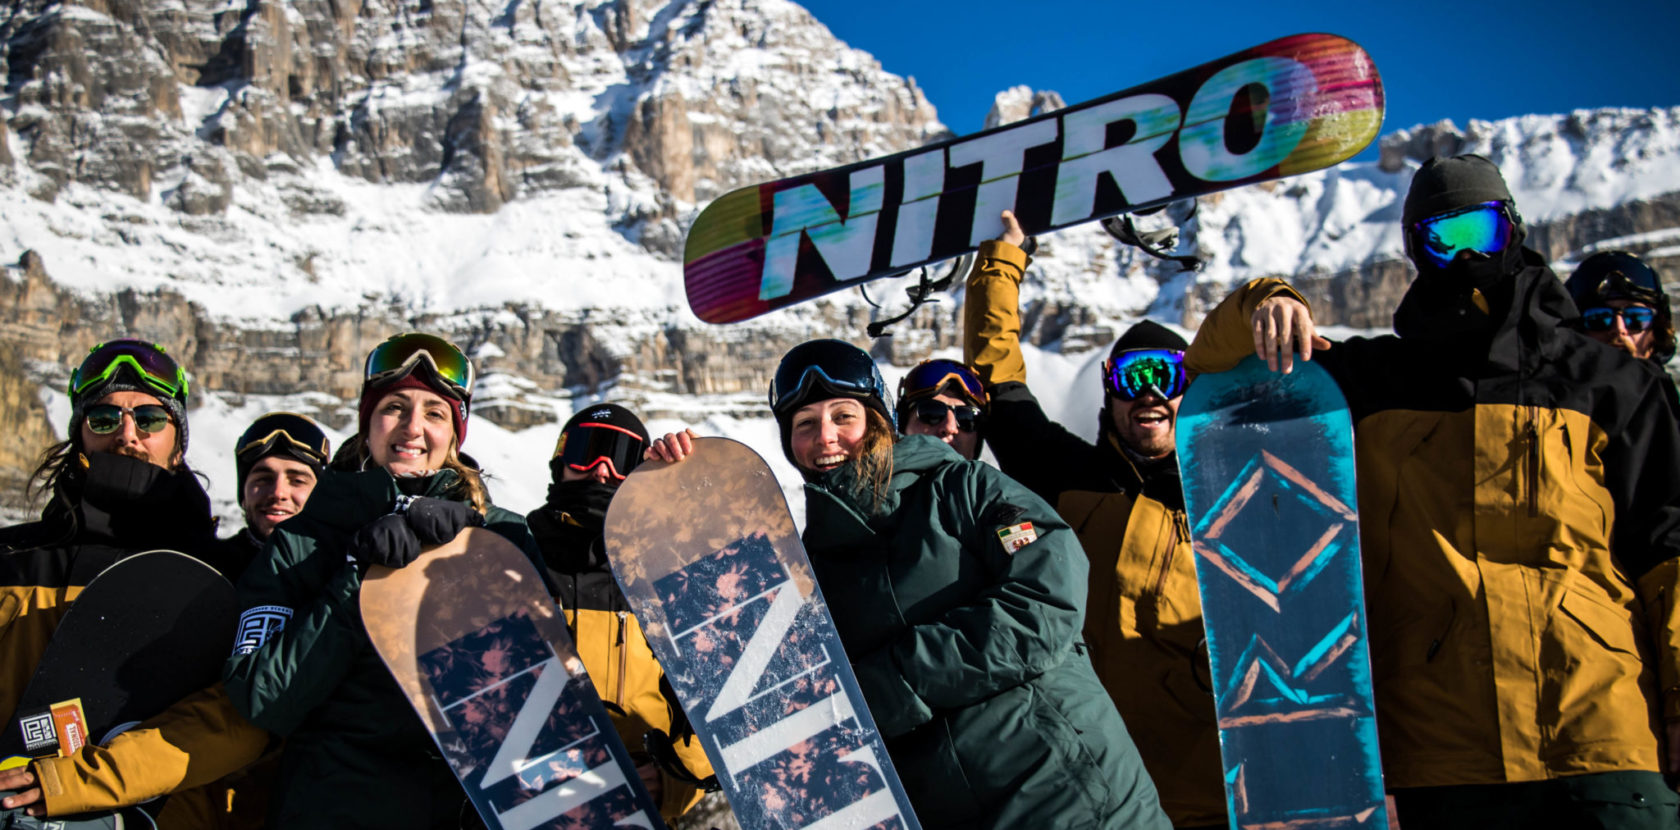 WE LOVE PROFESSIONAL SNOWBOARDING